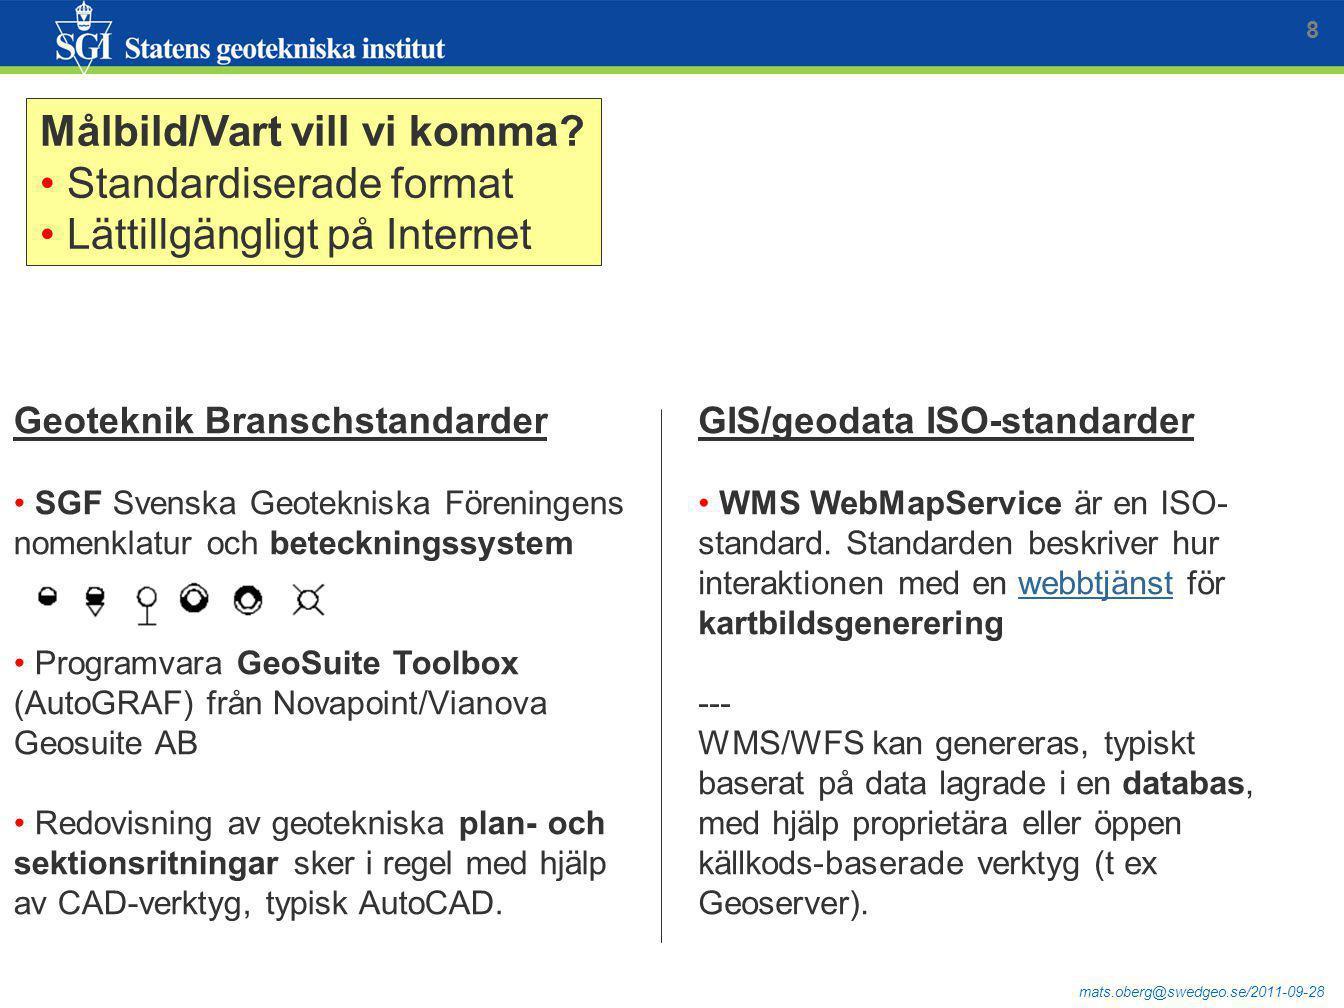 mats.oberg@swedgeo.se/2011-09-28 GIS/geodata ISO-standarder WMS WebMapService är en ISO- standard. Standarden beskriver hur interaktionen med en webbt